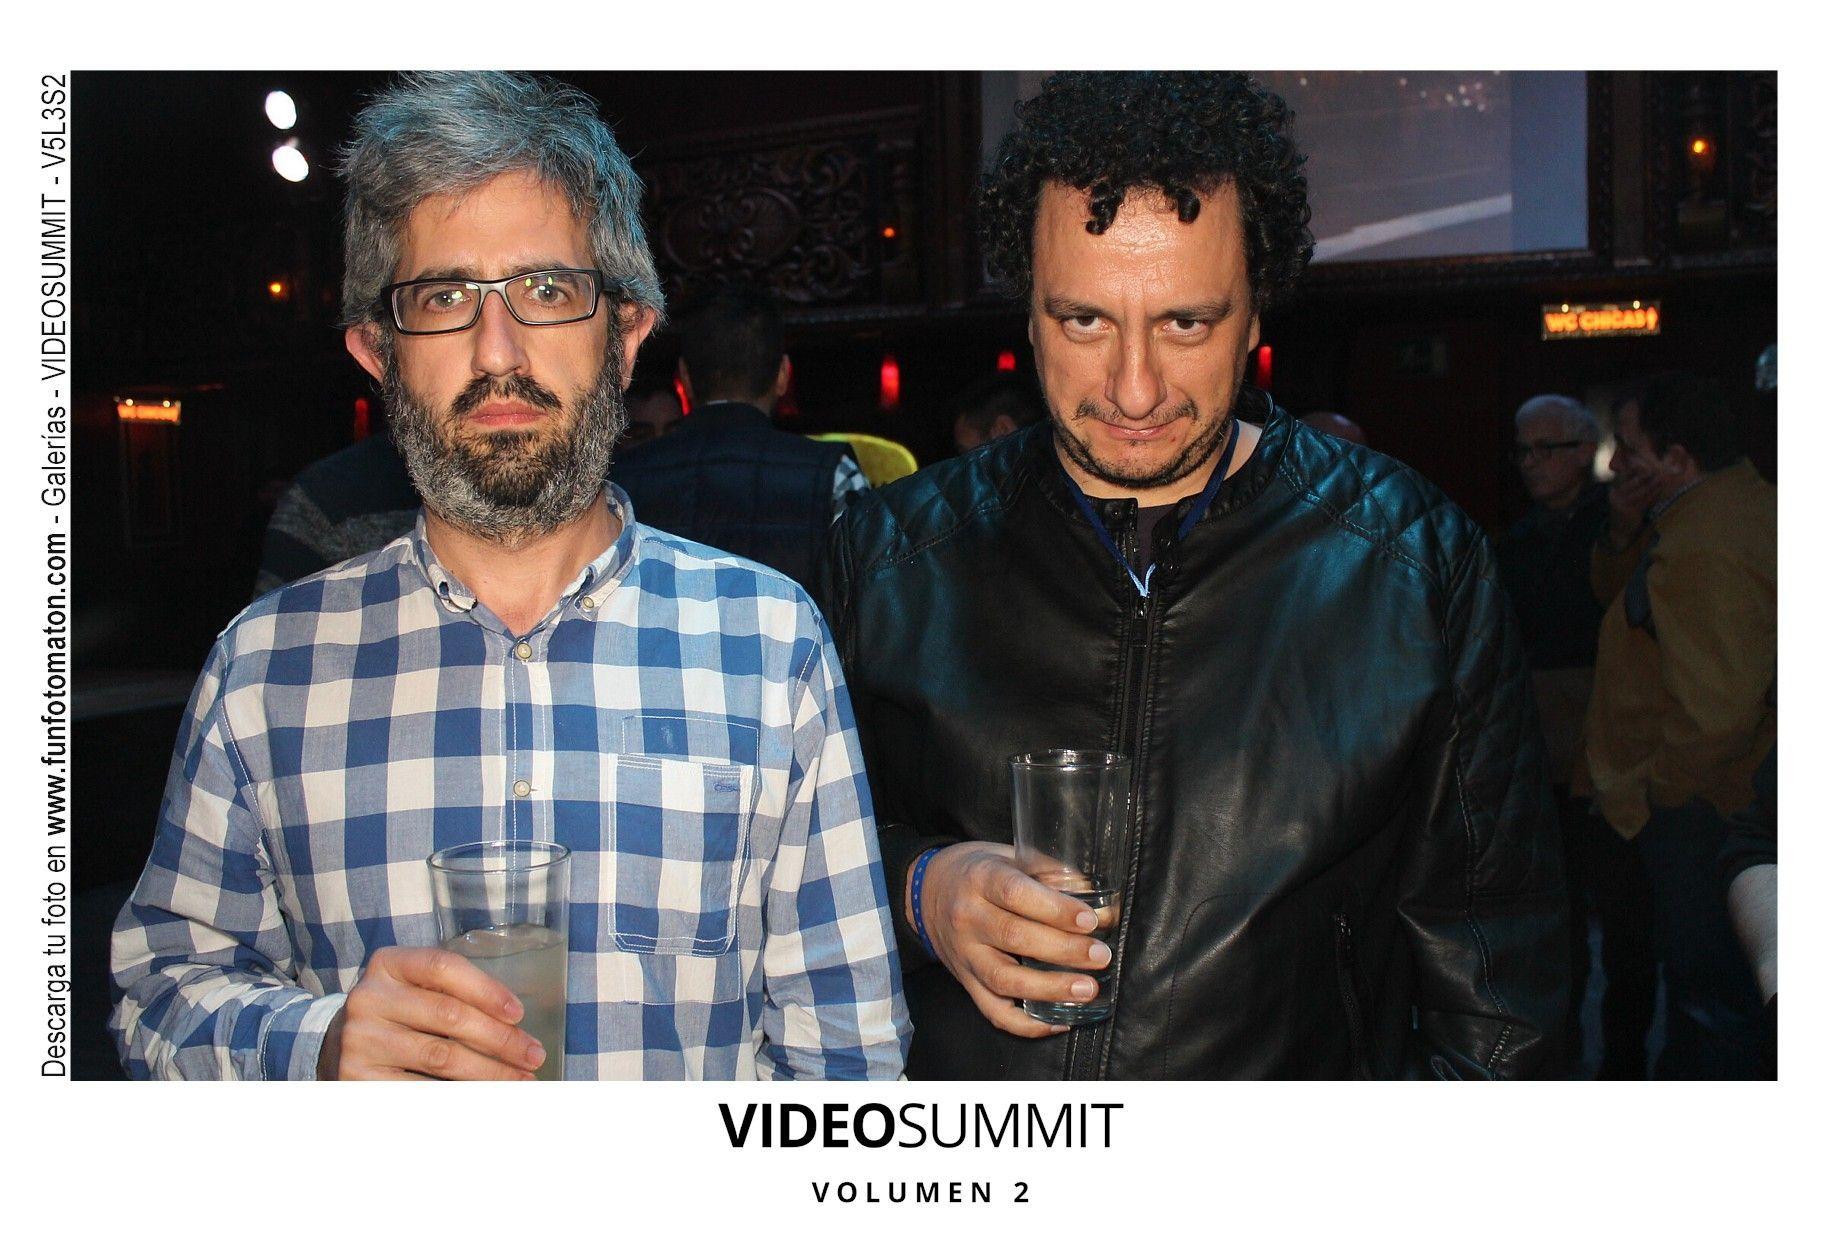 videosummit-vol2-club-party-052